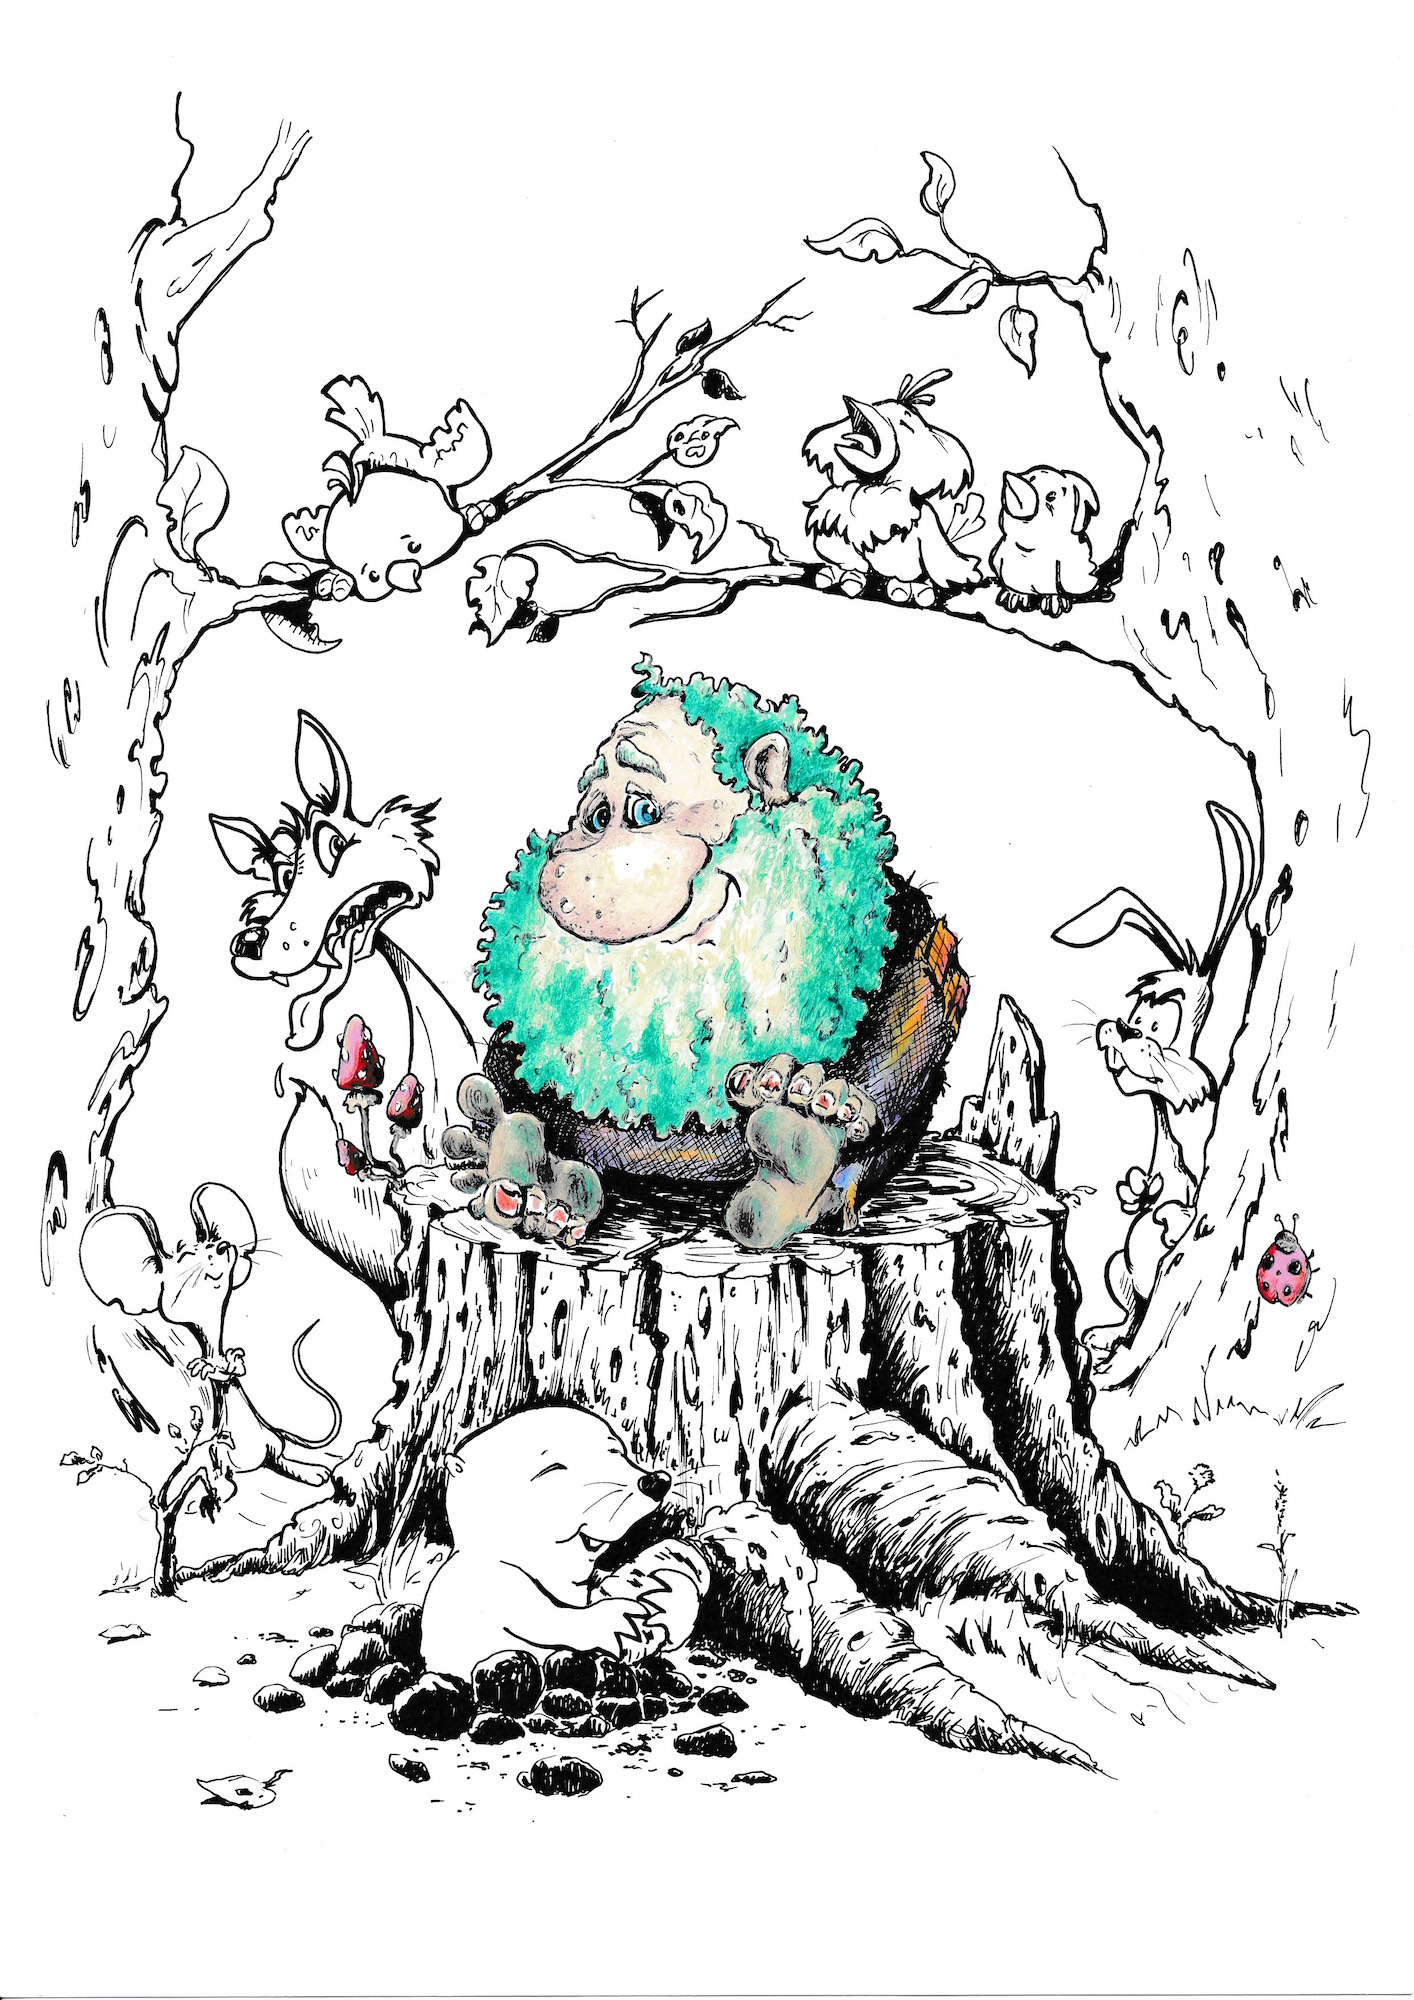 sokolpictures-illustrationen-2